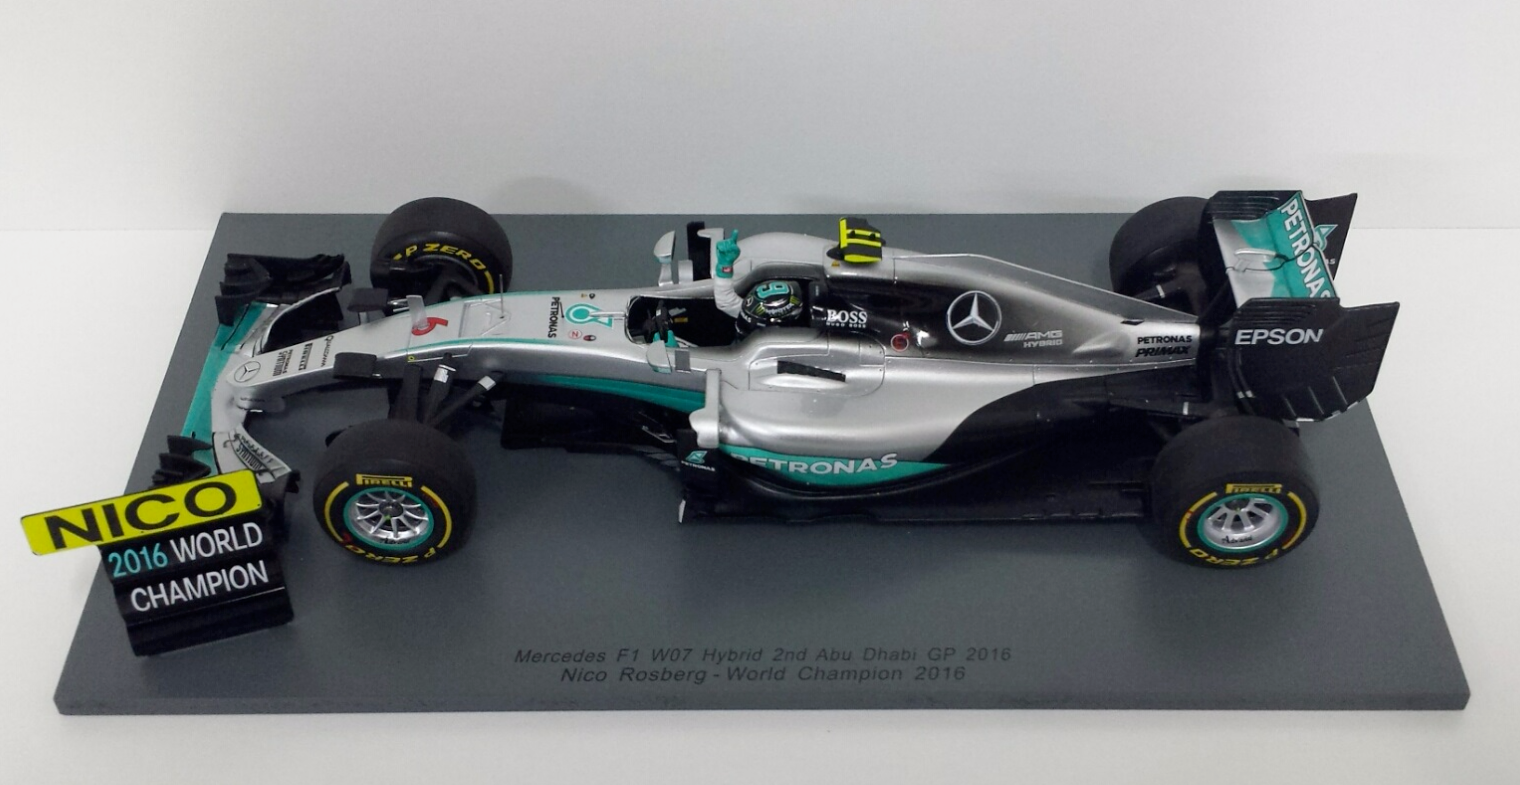 SPARK 1 18 F1 MERCEDES W07 NICO ROSBERG GP ABU DHABI 2016 WORLD CHAMPION 18S250